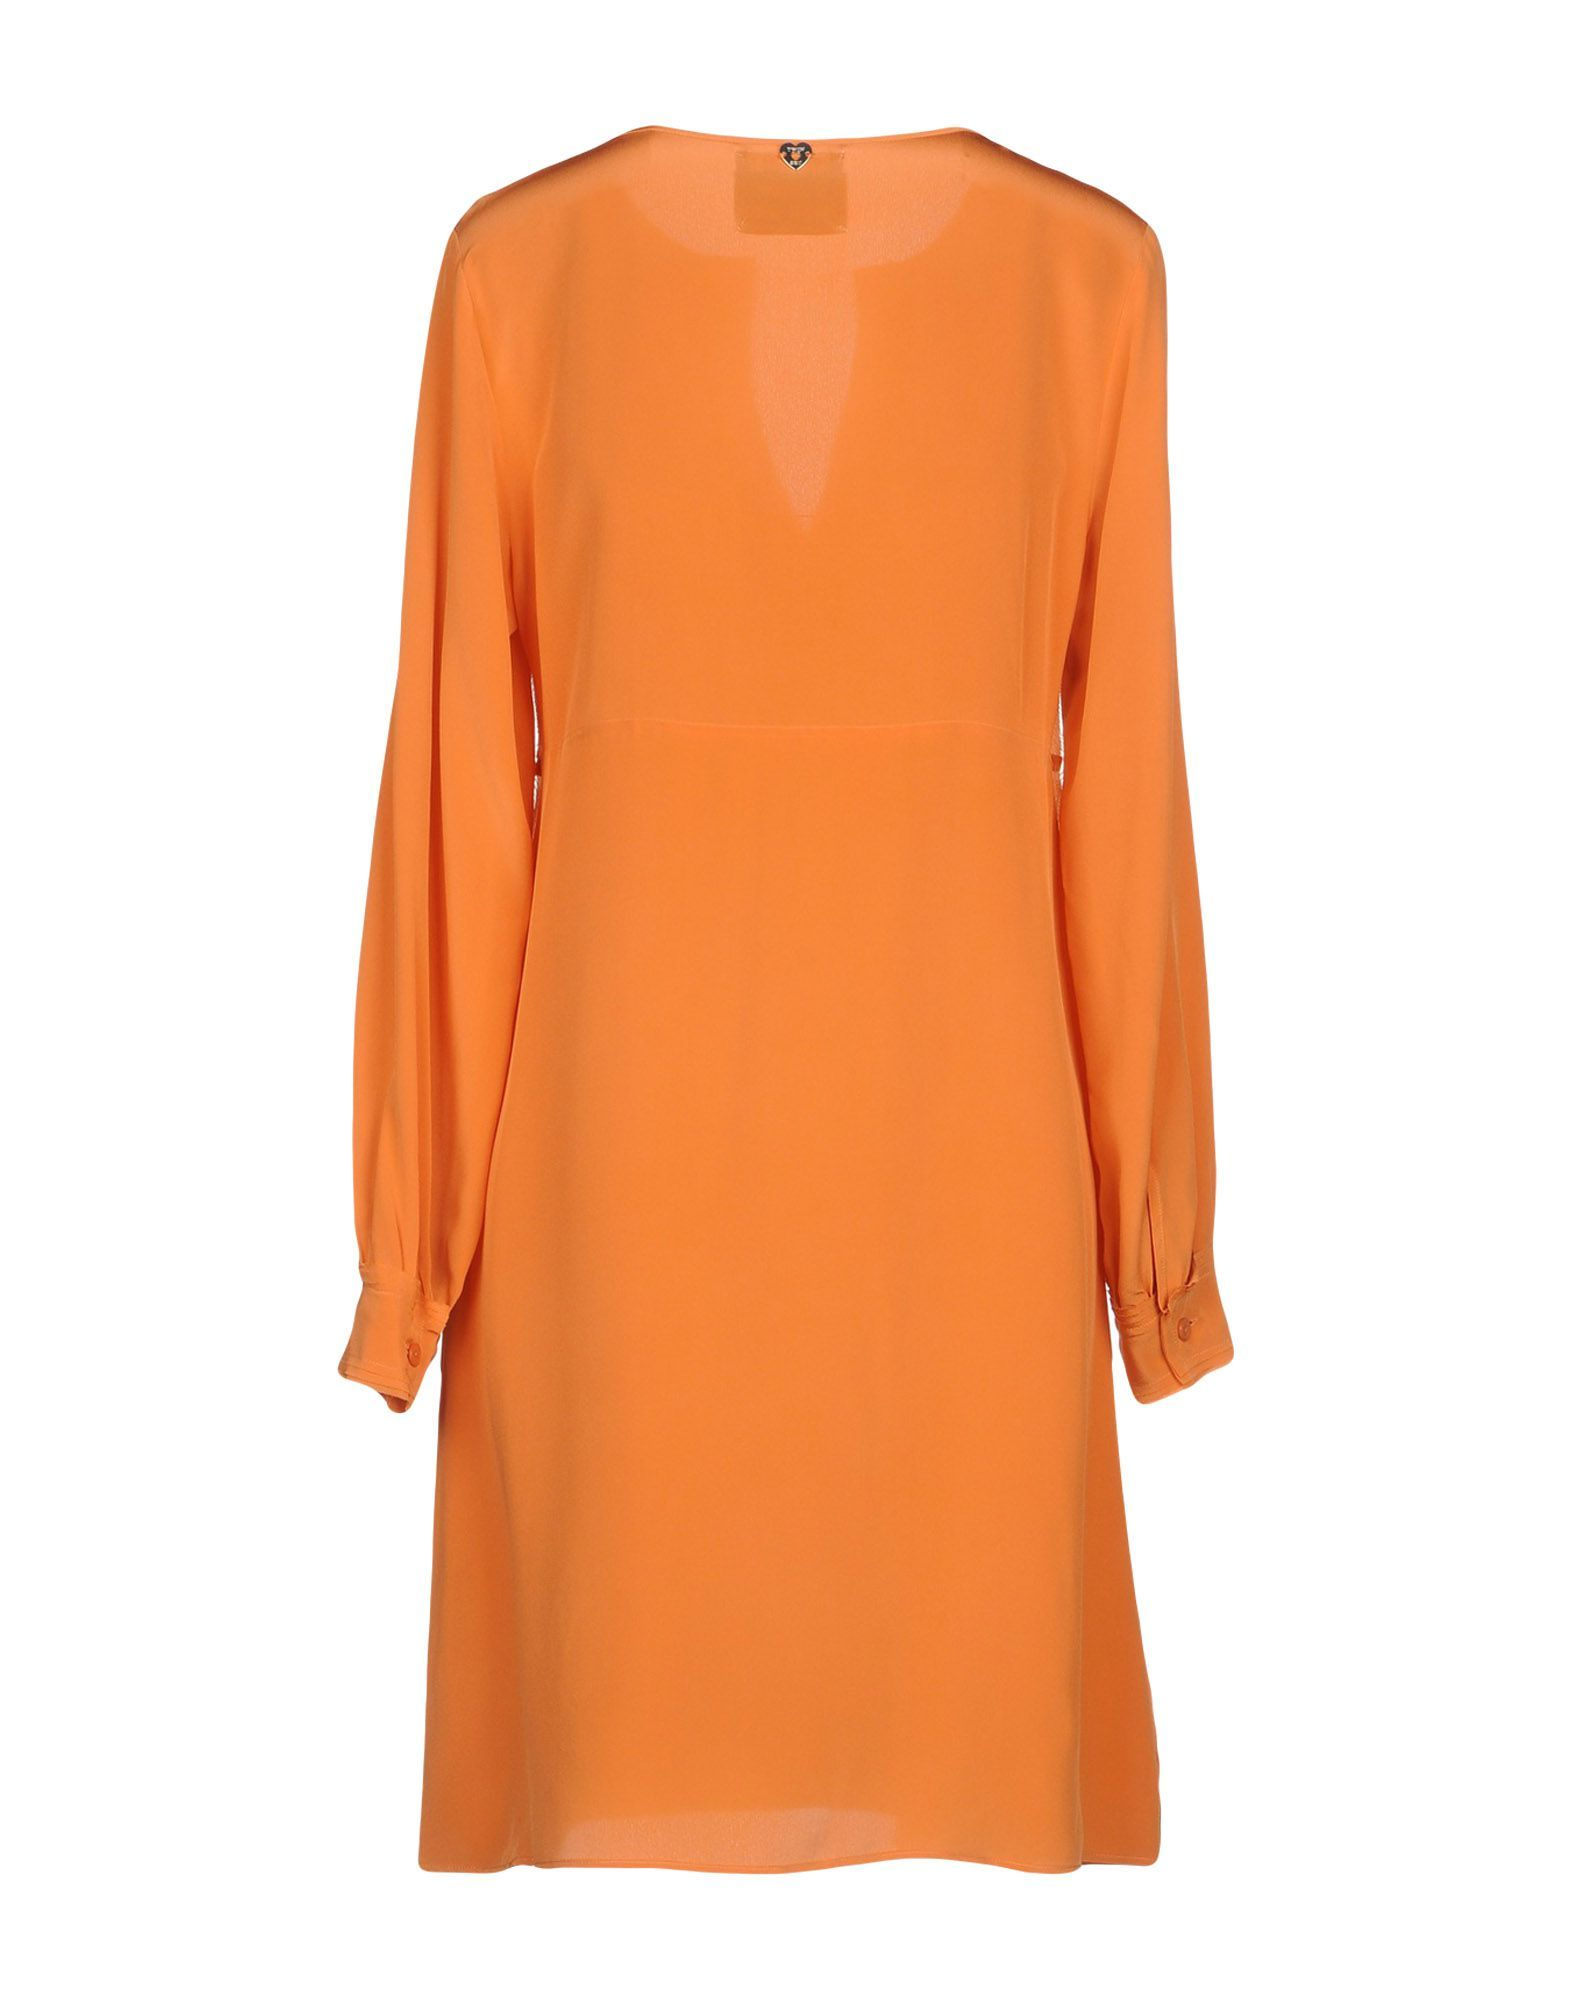 Twinset Orange Silk Long Sleeve Dress